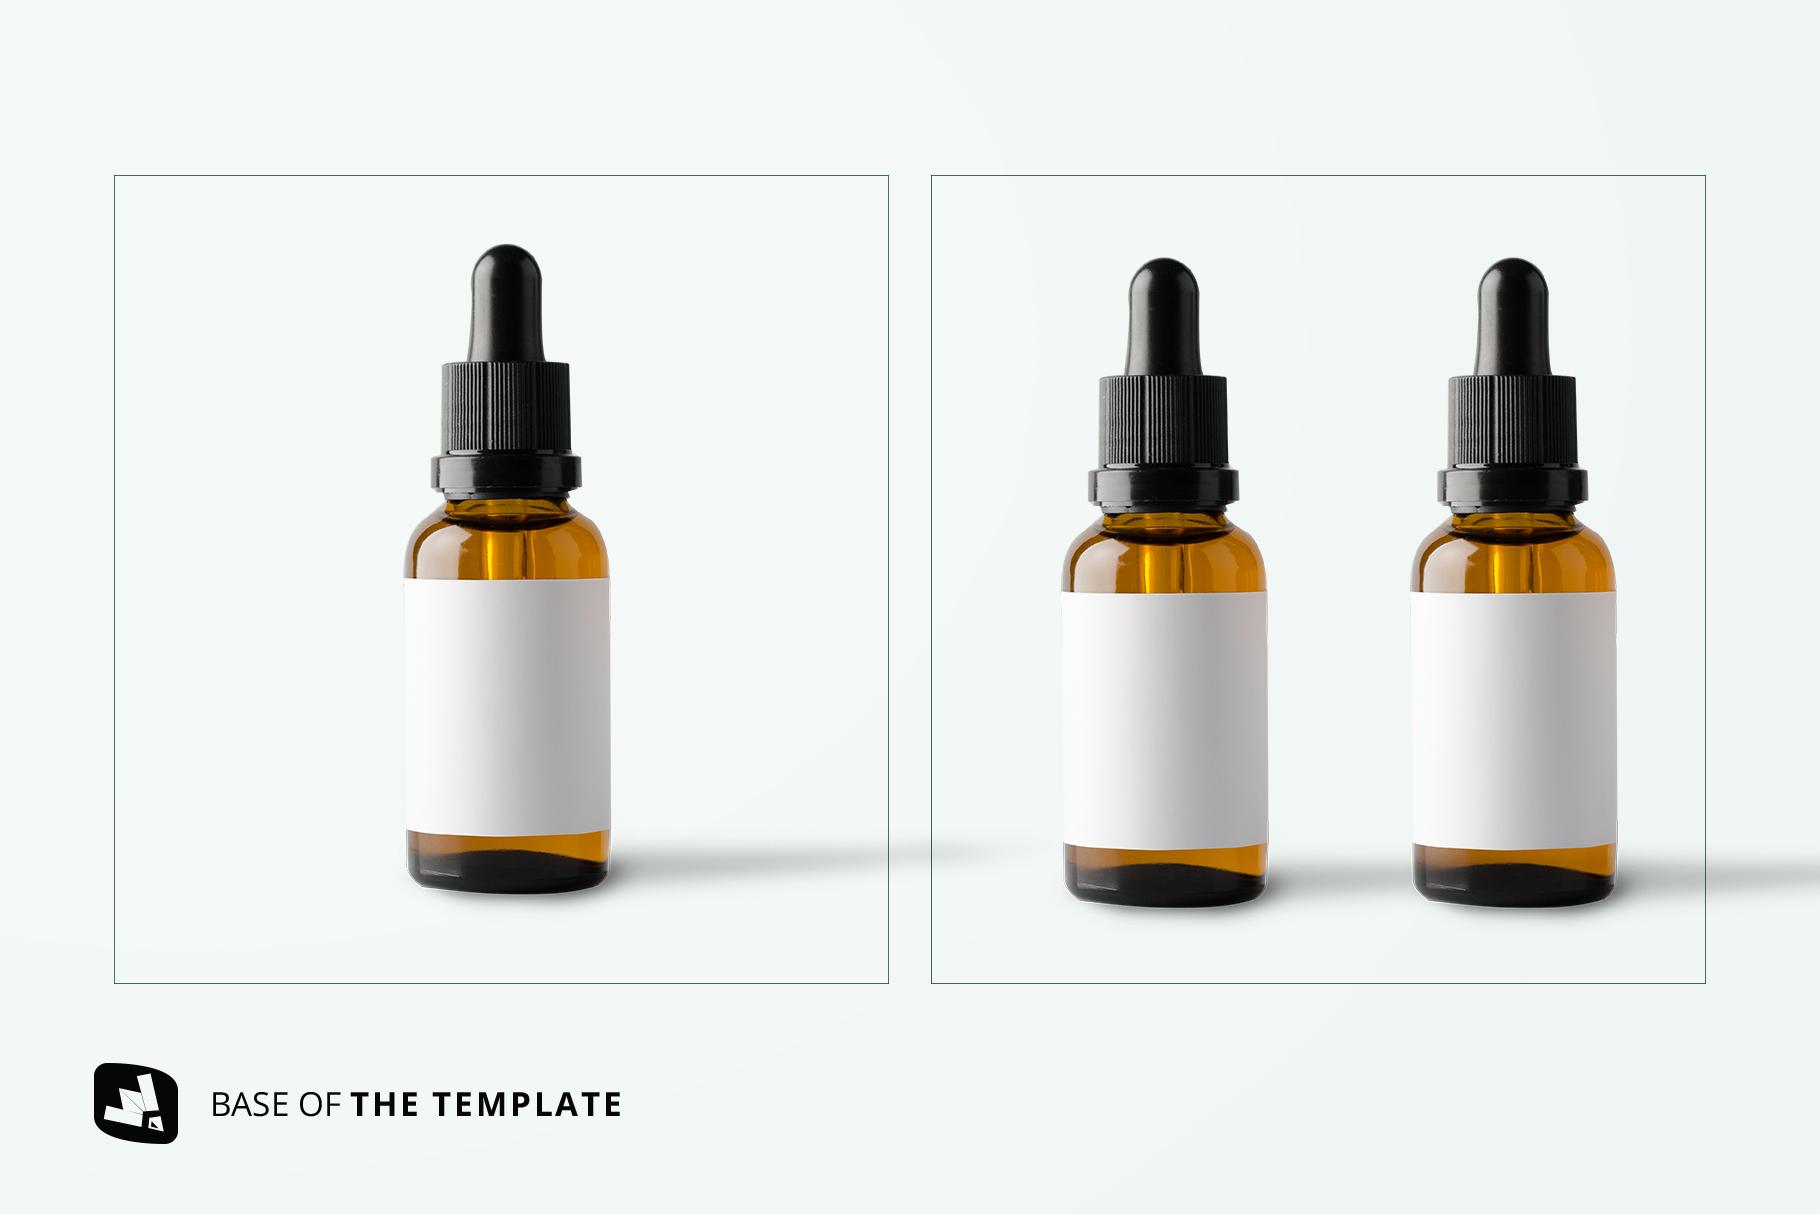 base image of the essential oil bottle packaging mockup